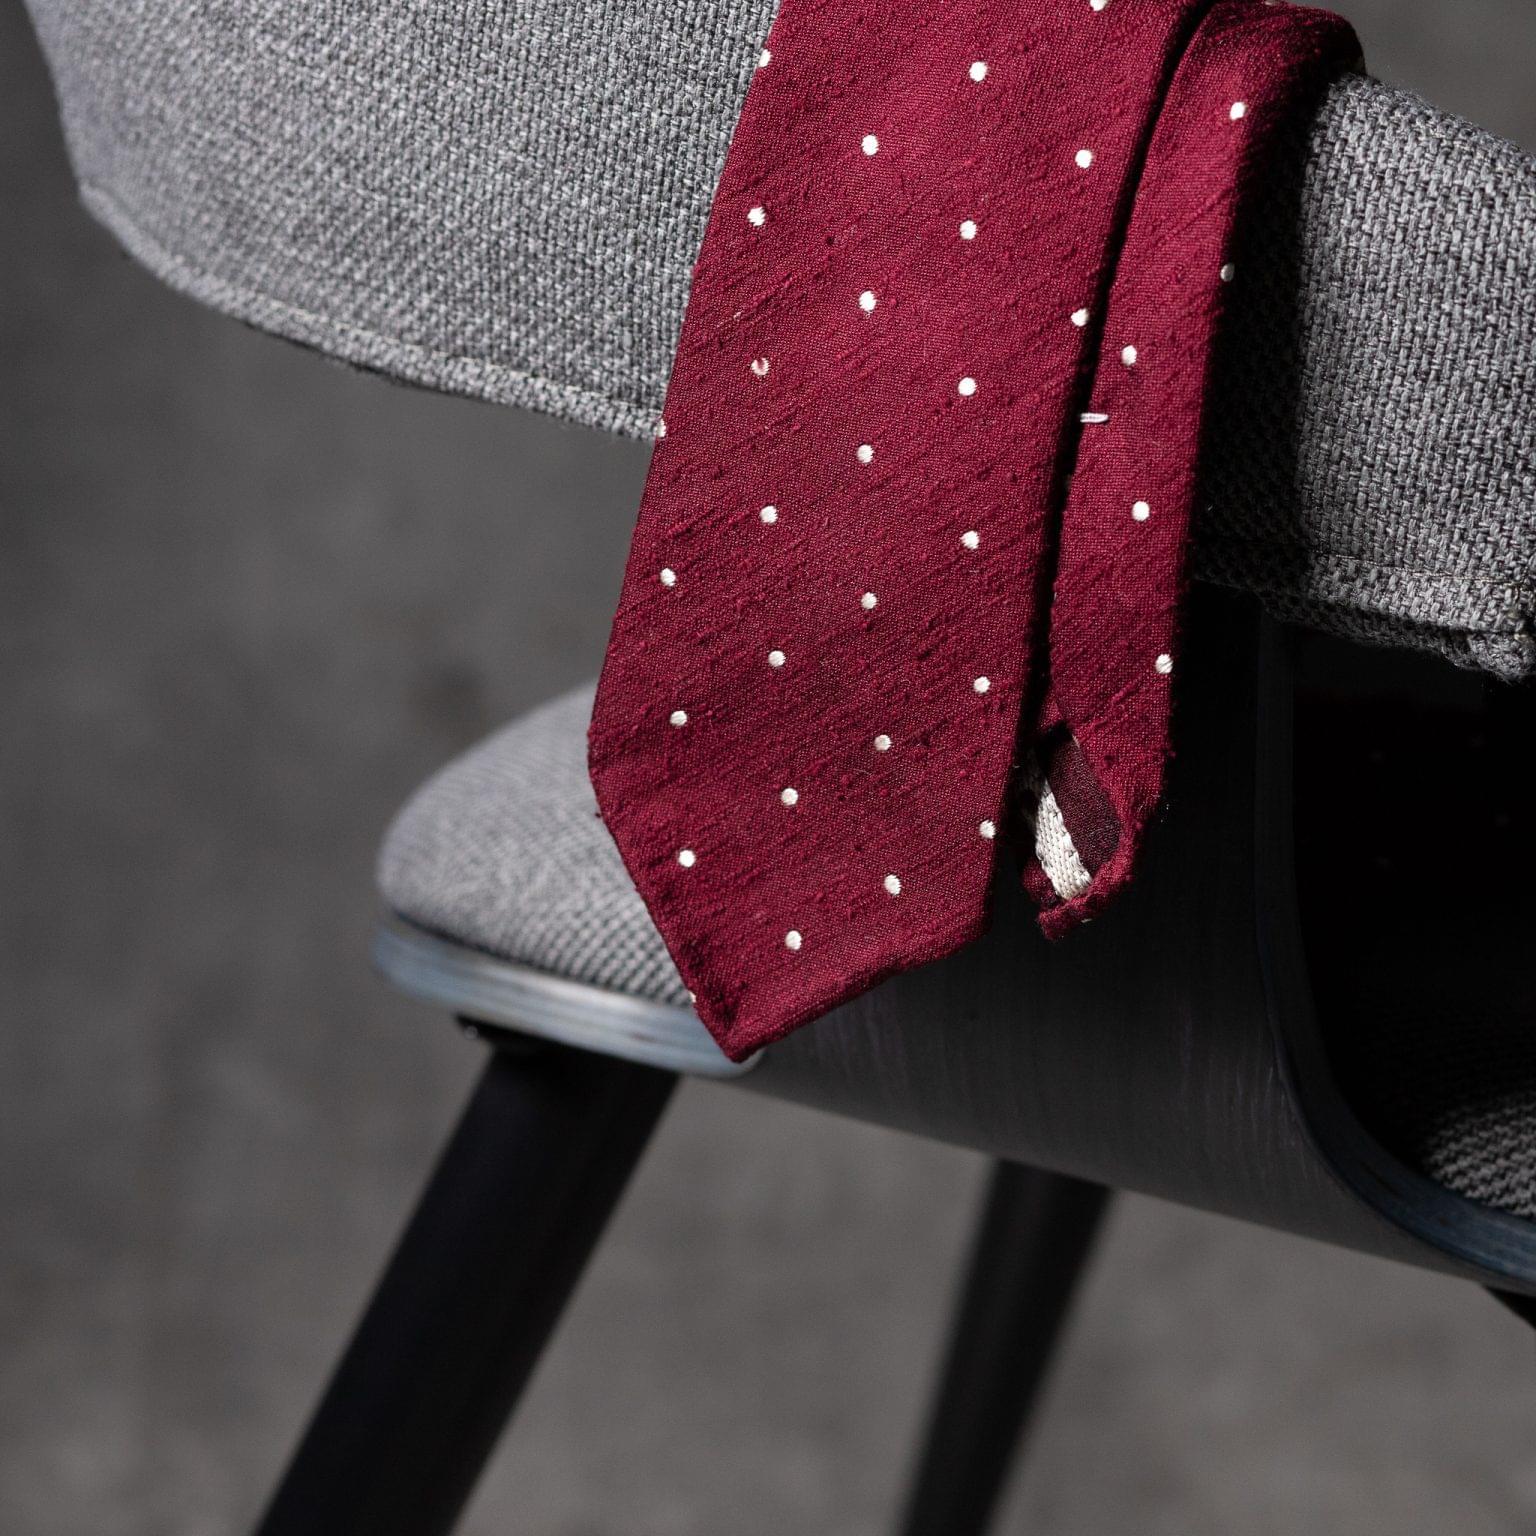 SHANTUNG-0528-Tie-Initials-Corbata-Iniciales-The-Seelk-2